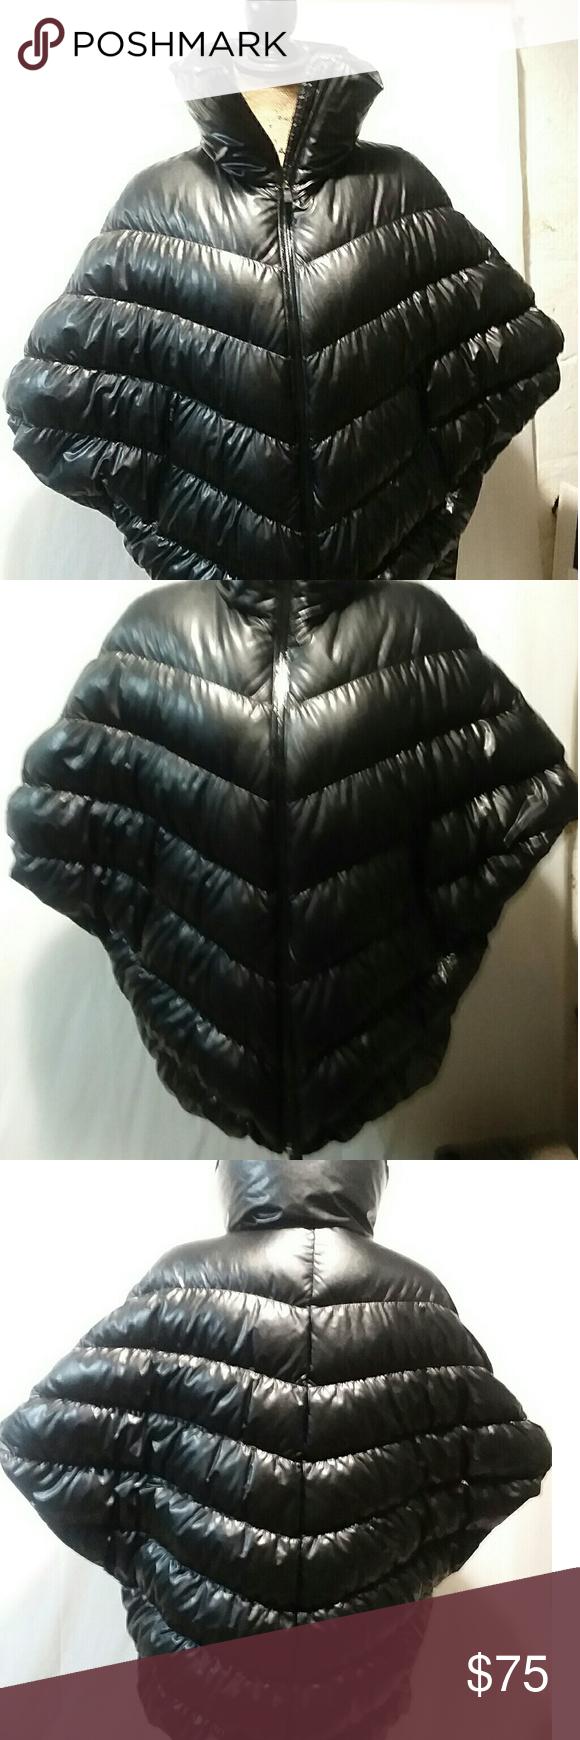 47a1c75c7a6b NIke XS Black Down Cascade Puffer Poncho Jacket Brand - NIKE Color - Black  Size -